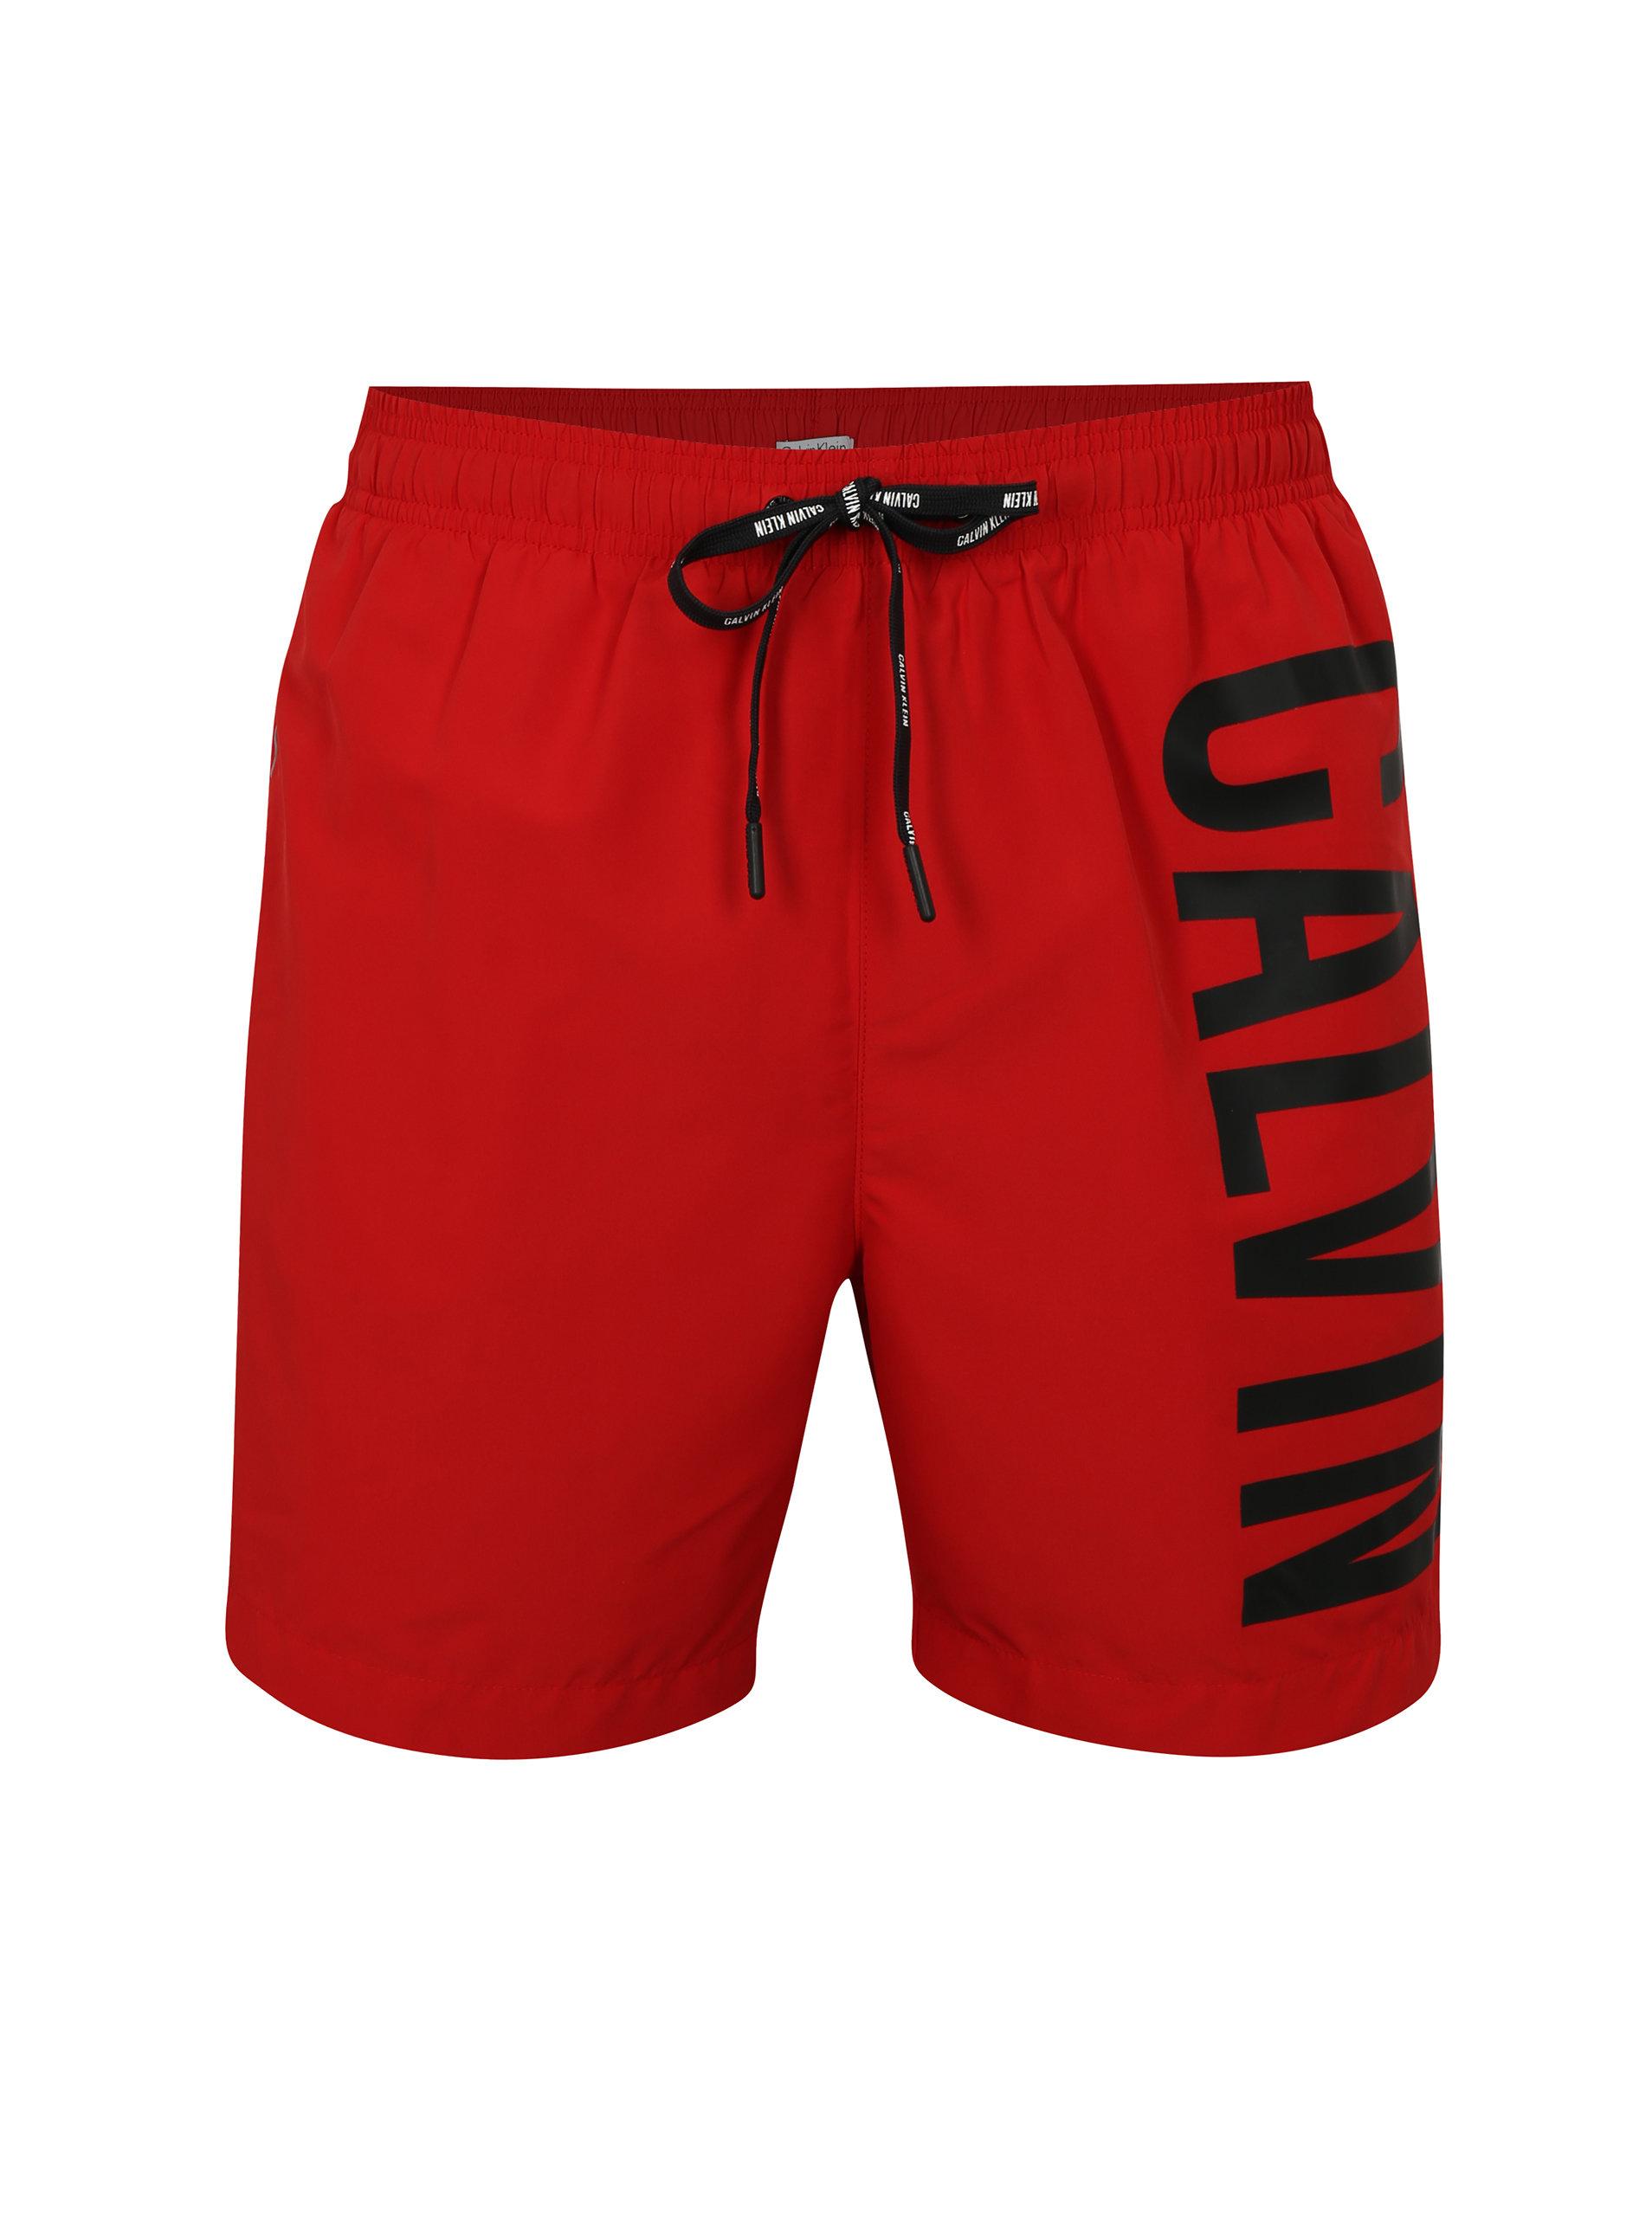 17cf43cbf43c2 Pantaloni scurti de baie rosii cu print pentru barbati - Calvin Klein  Underwear ...